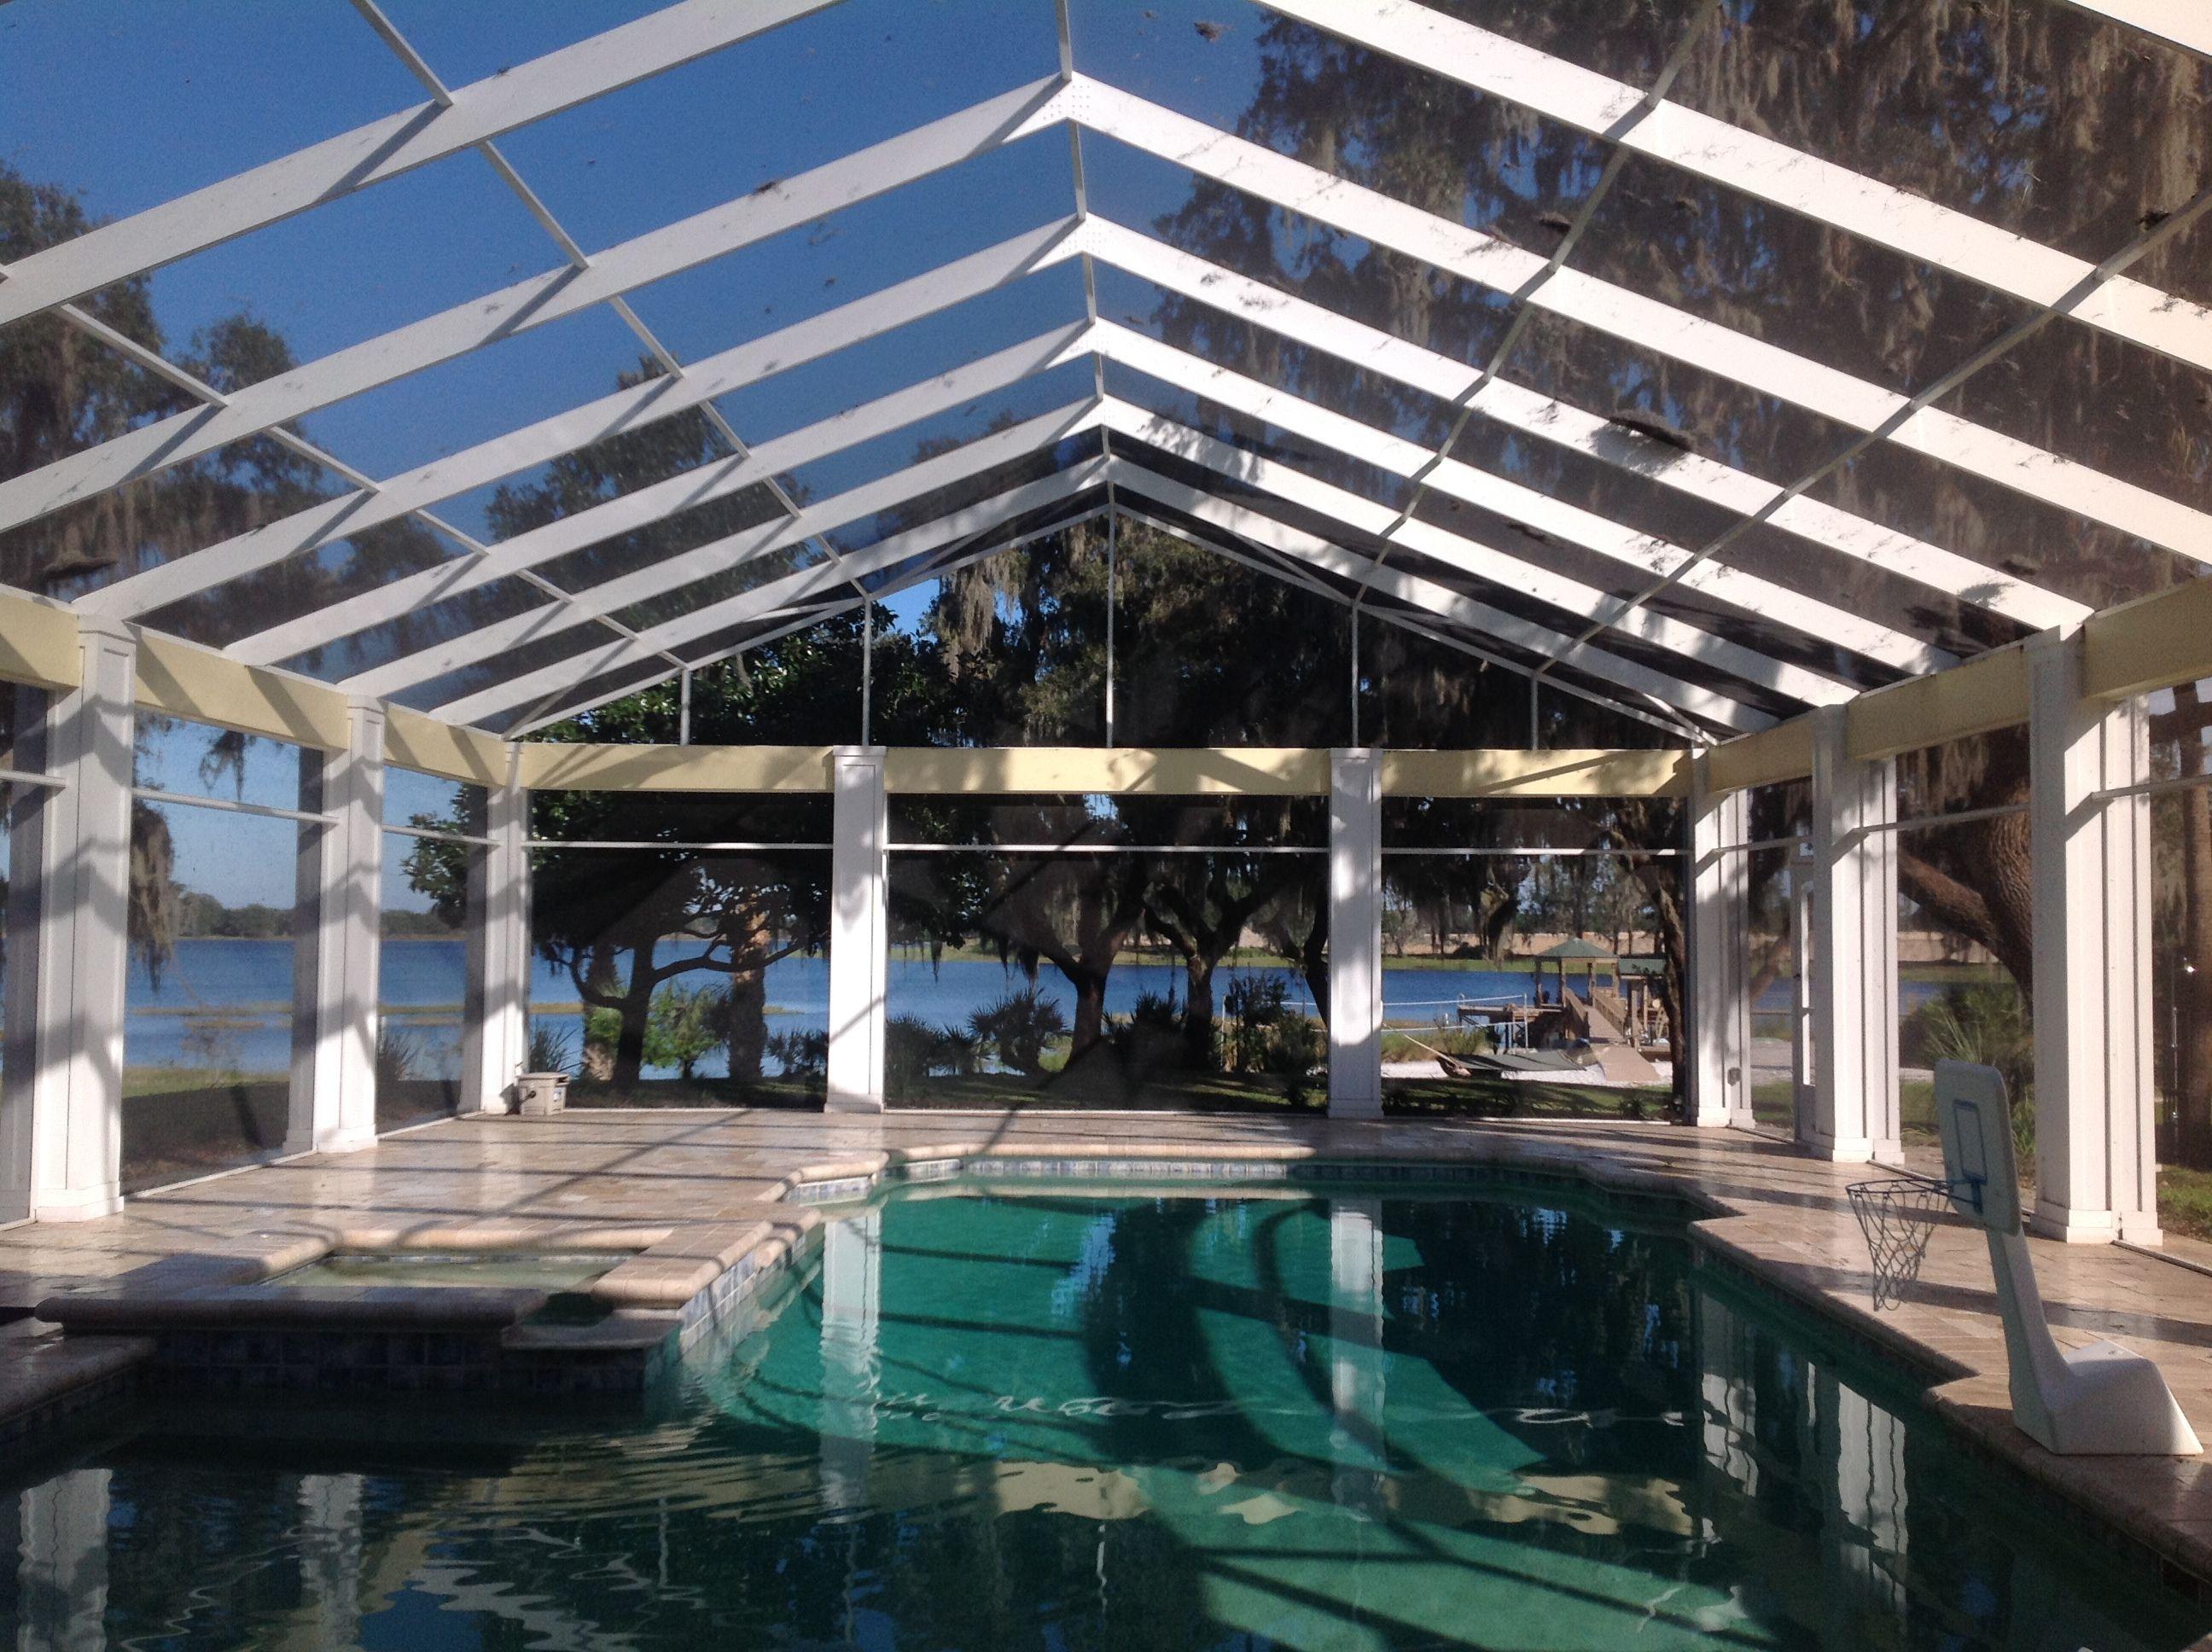 Orlando Screen Enclosures Pool Enclosures And Aluminum Awnings Garden Pinterest Screen